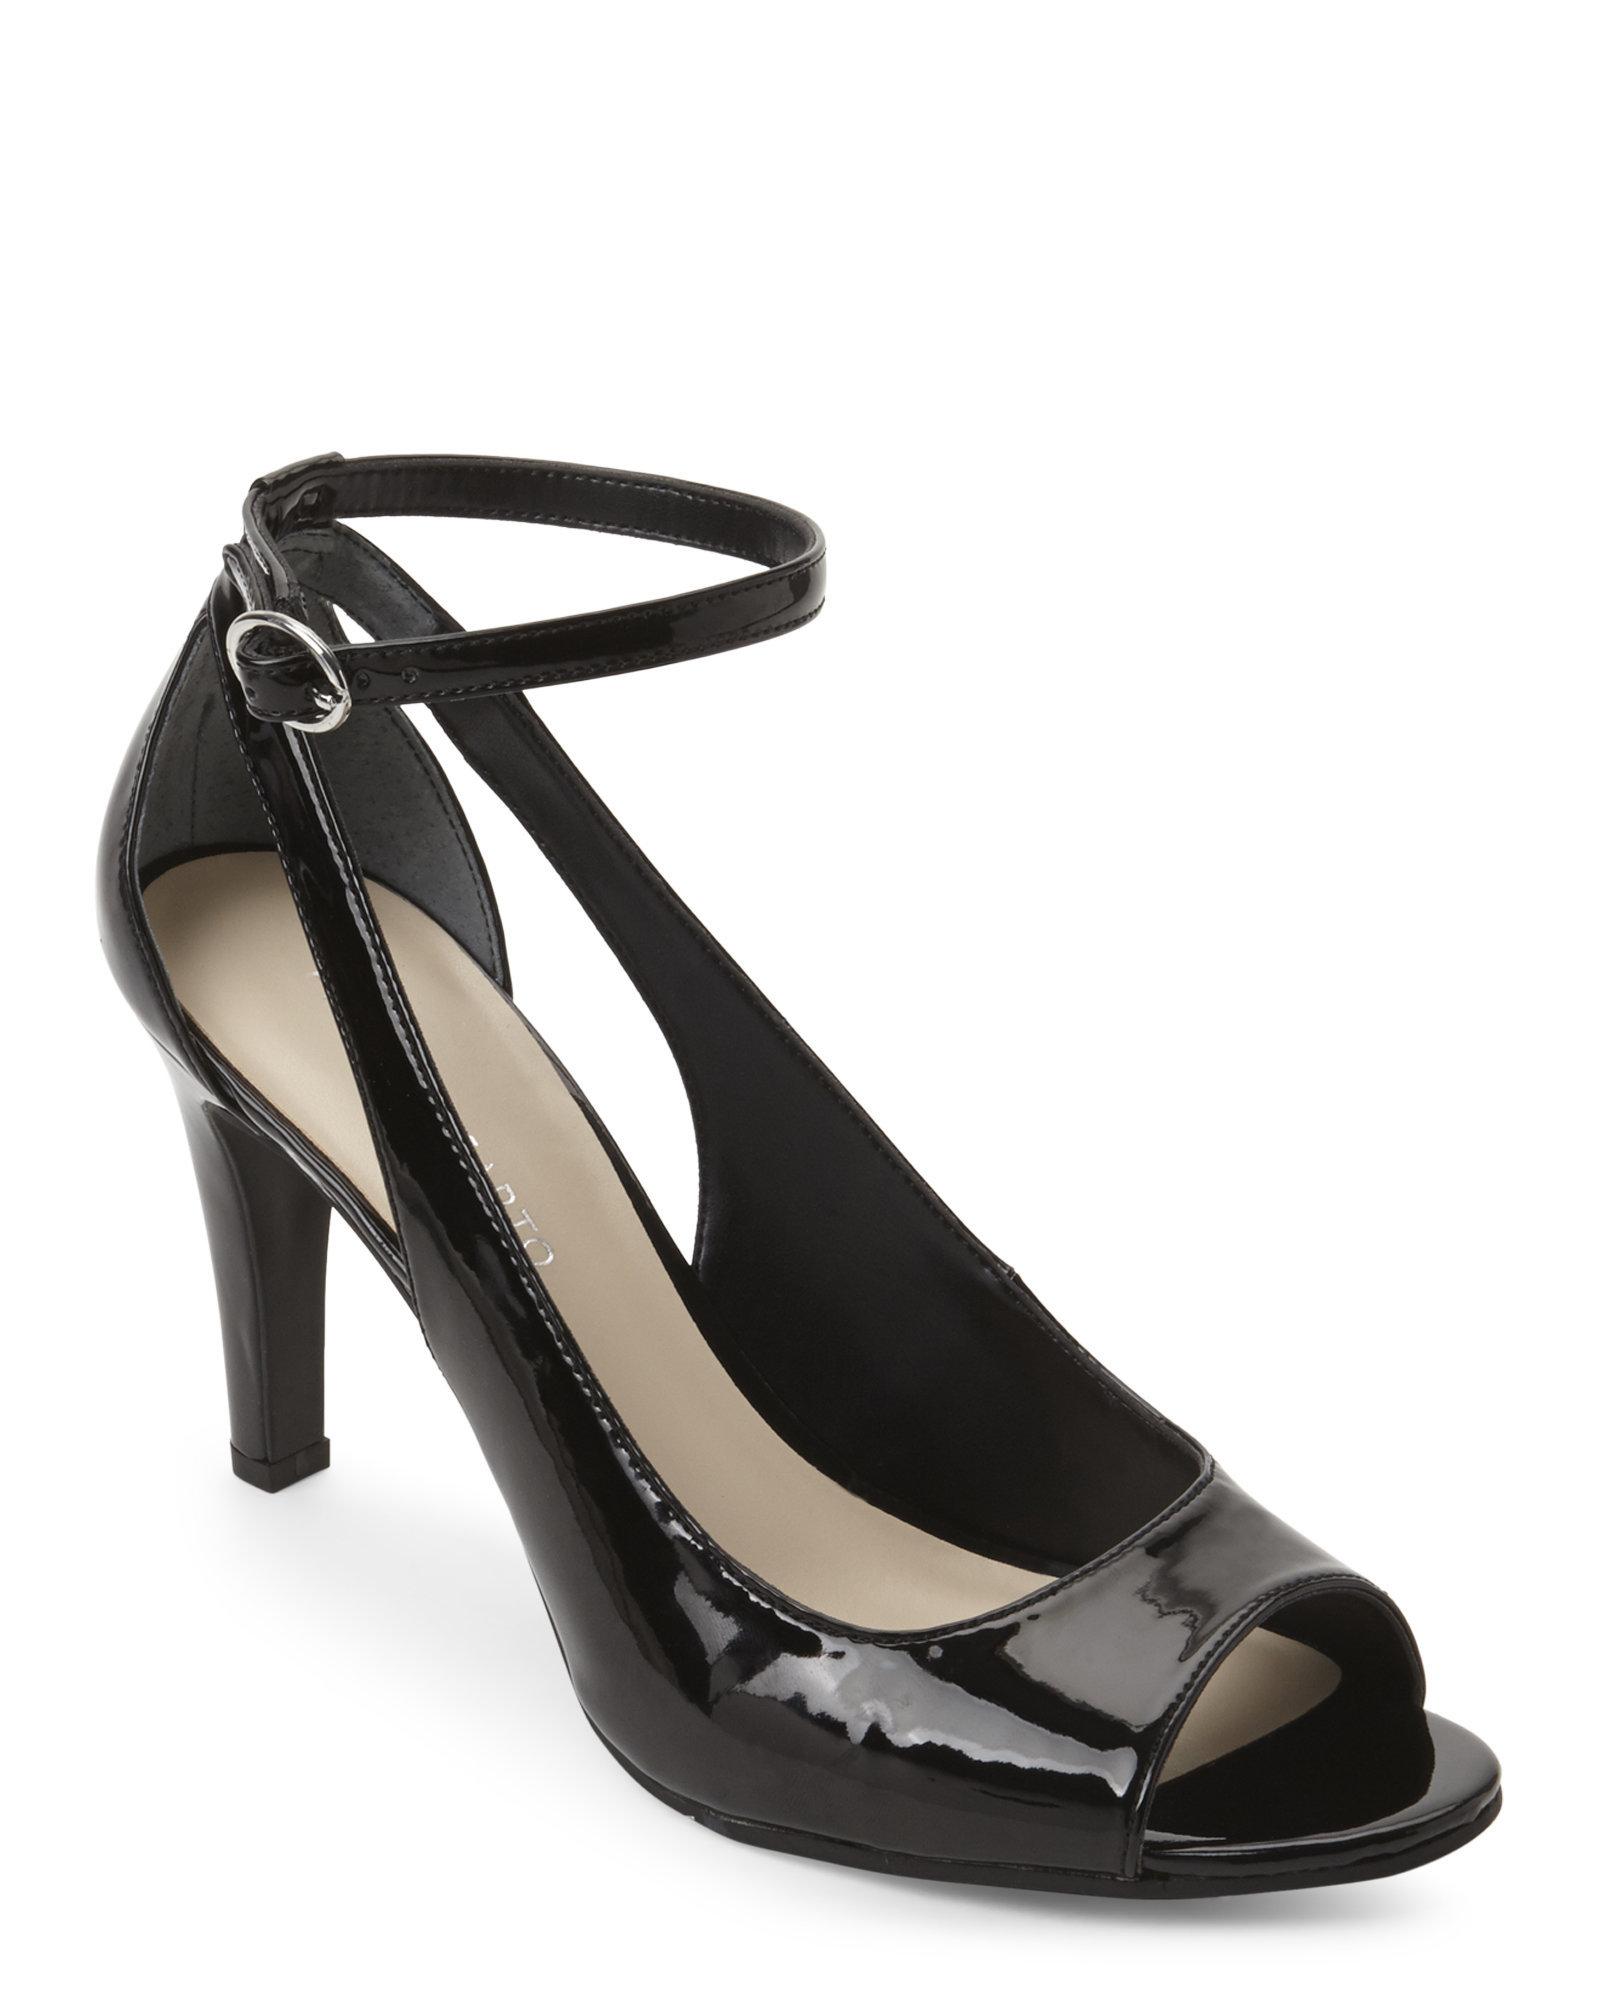 Lyst Franco Sarto Black Emmy Ankle Strap Pumps In Black